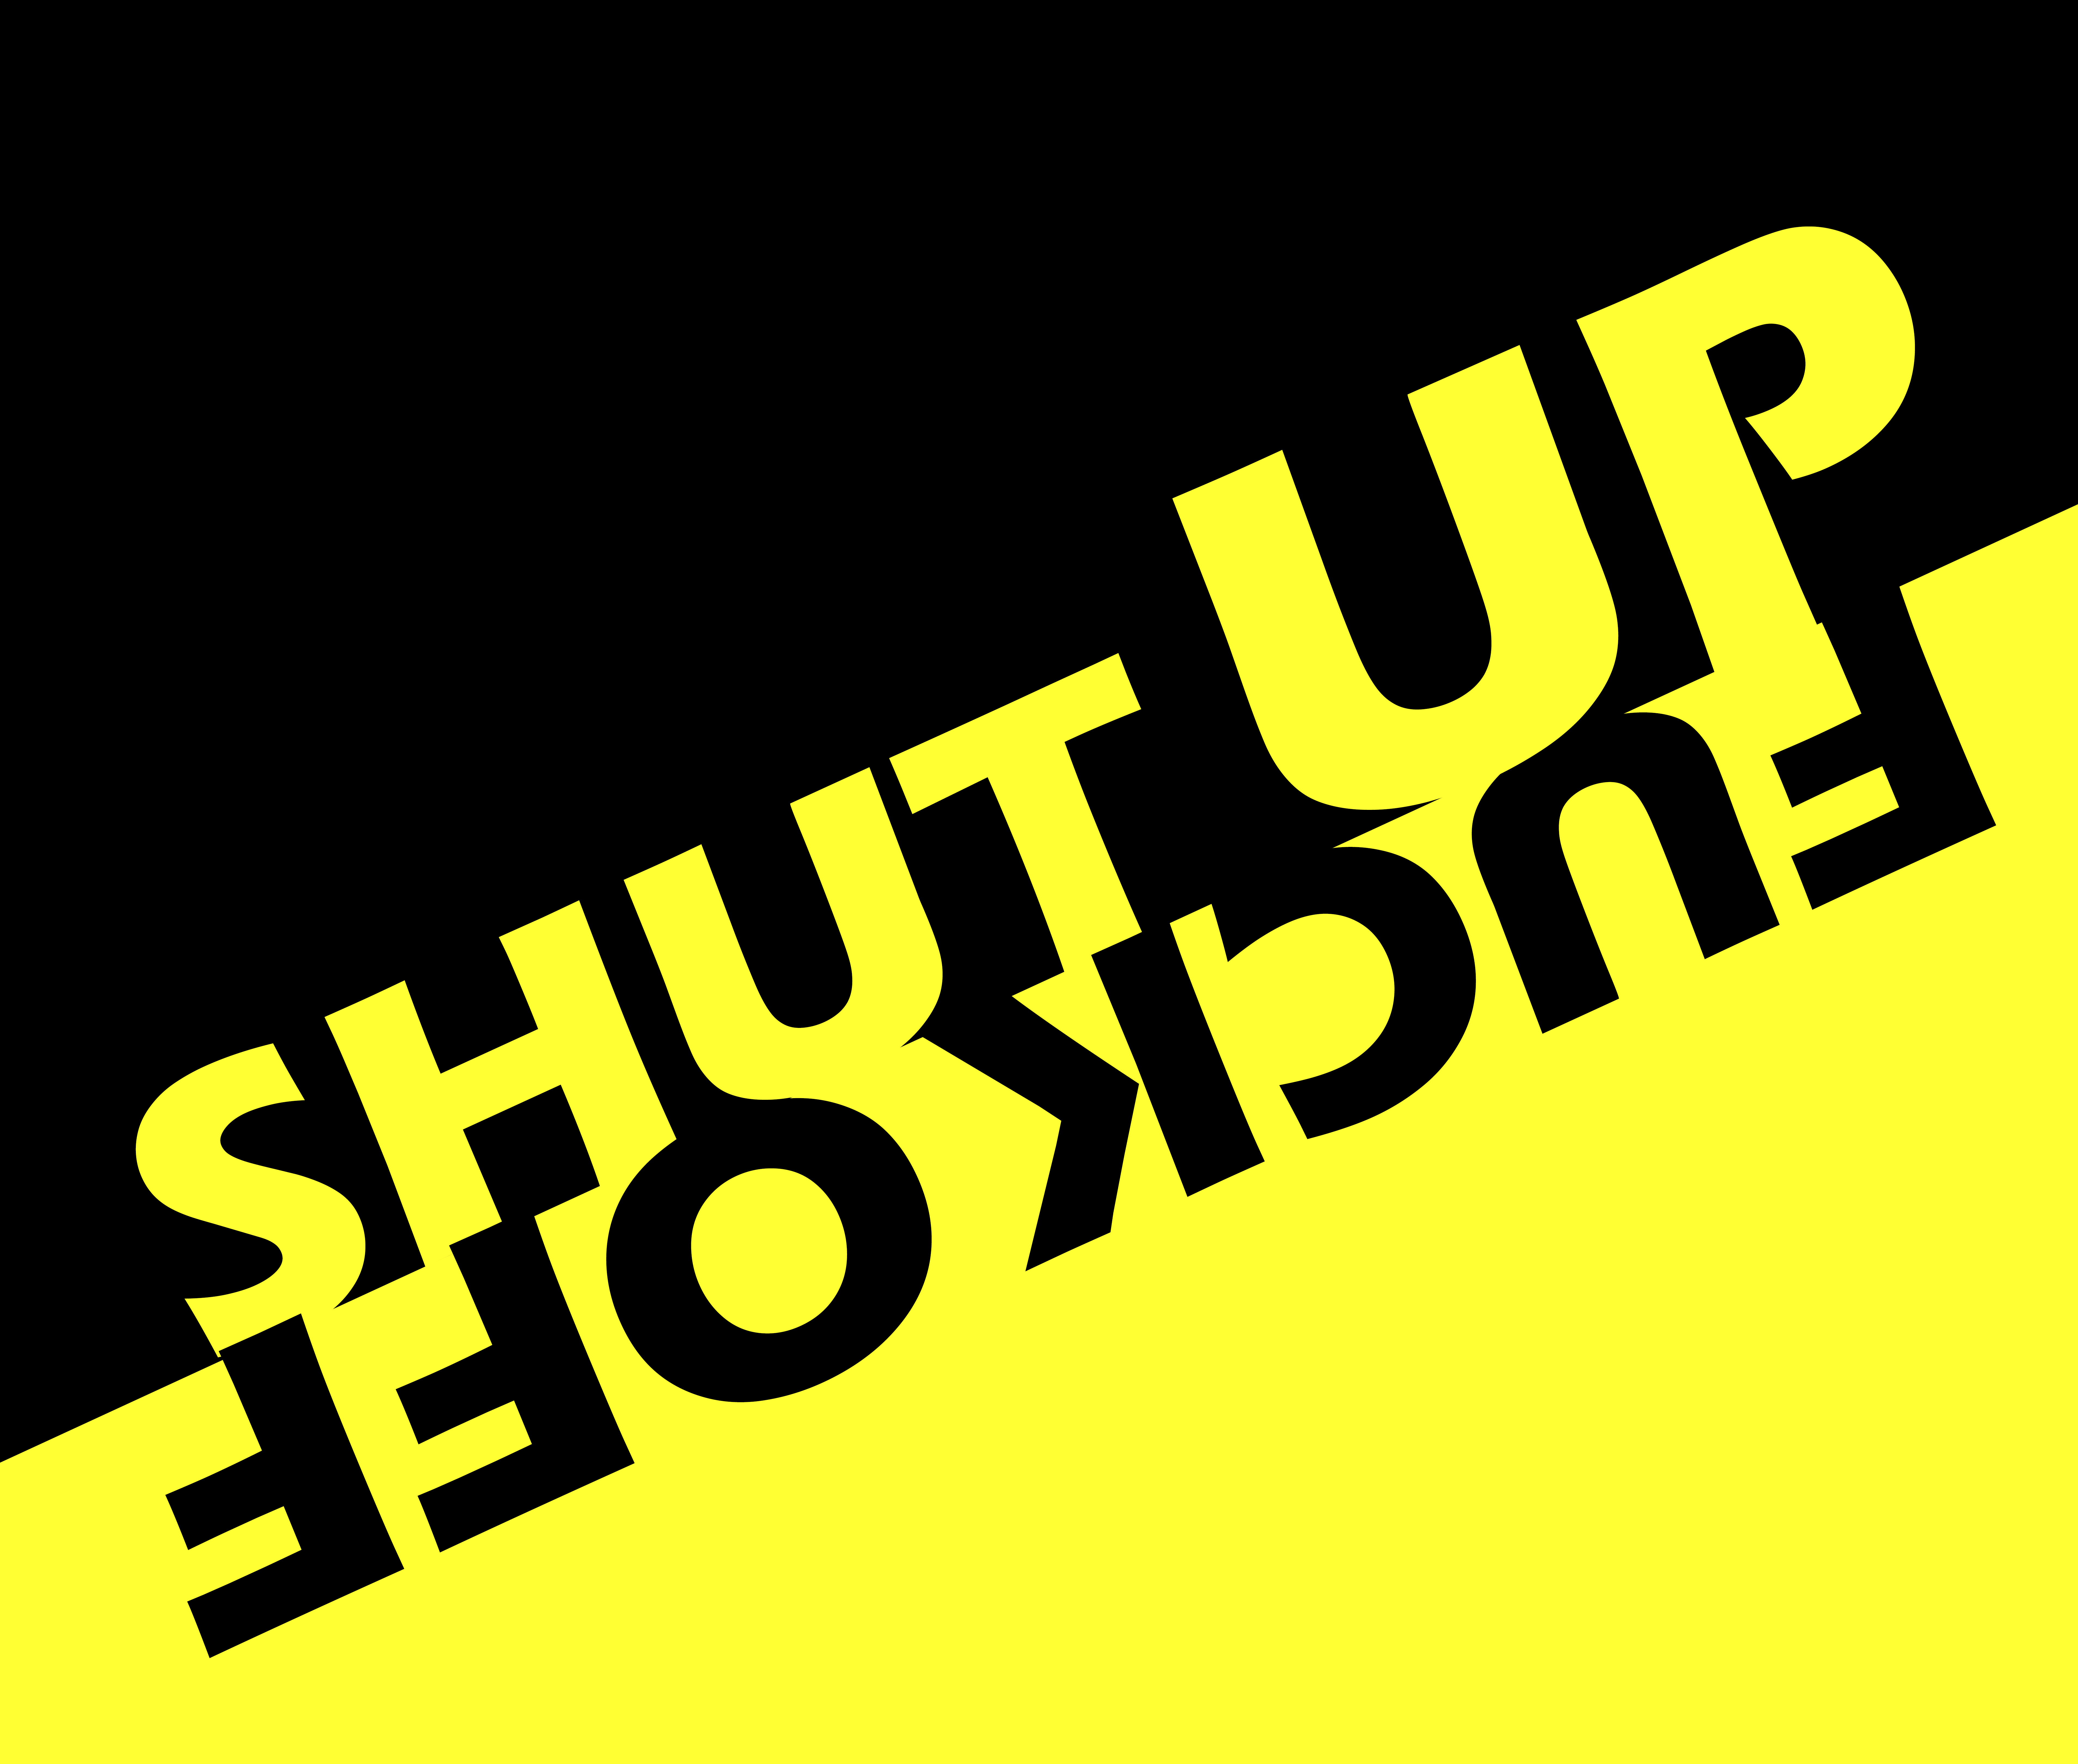 Shut Up - Fuck Off